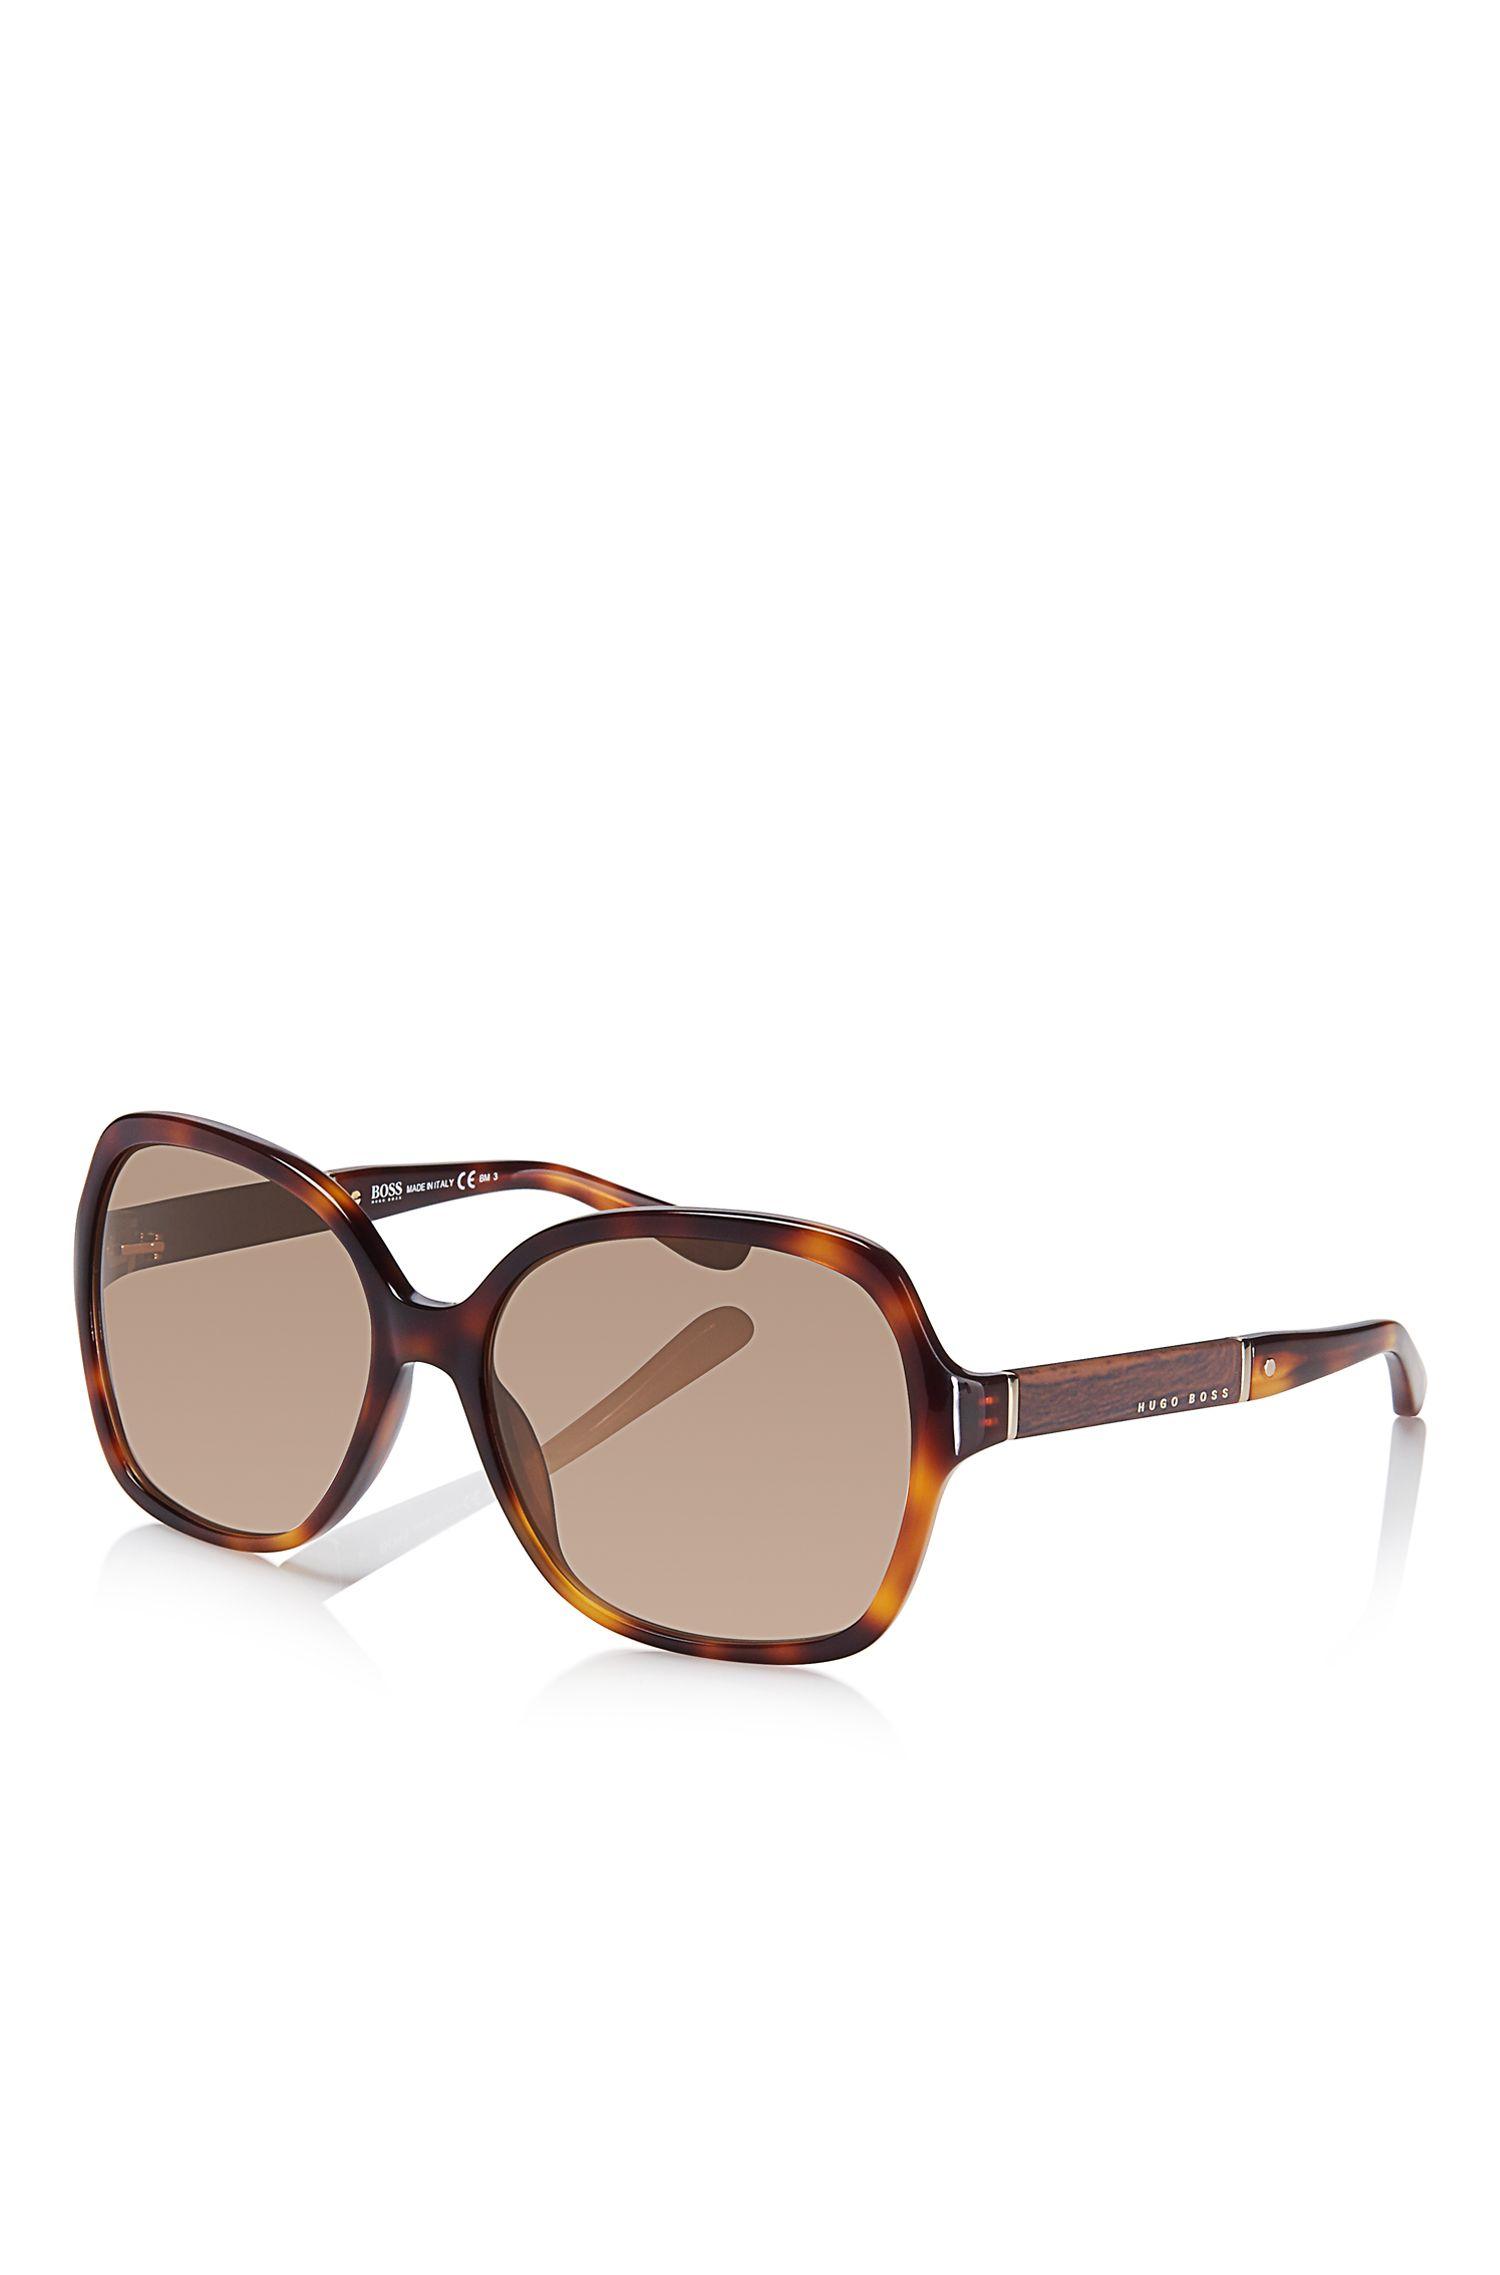 'BOSS' | Square Tortoiseshell Pattern Sunglasses